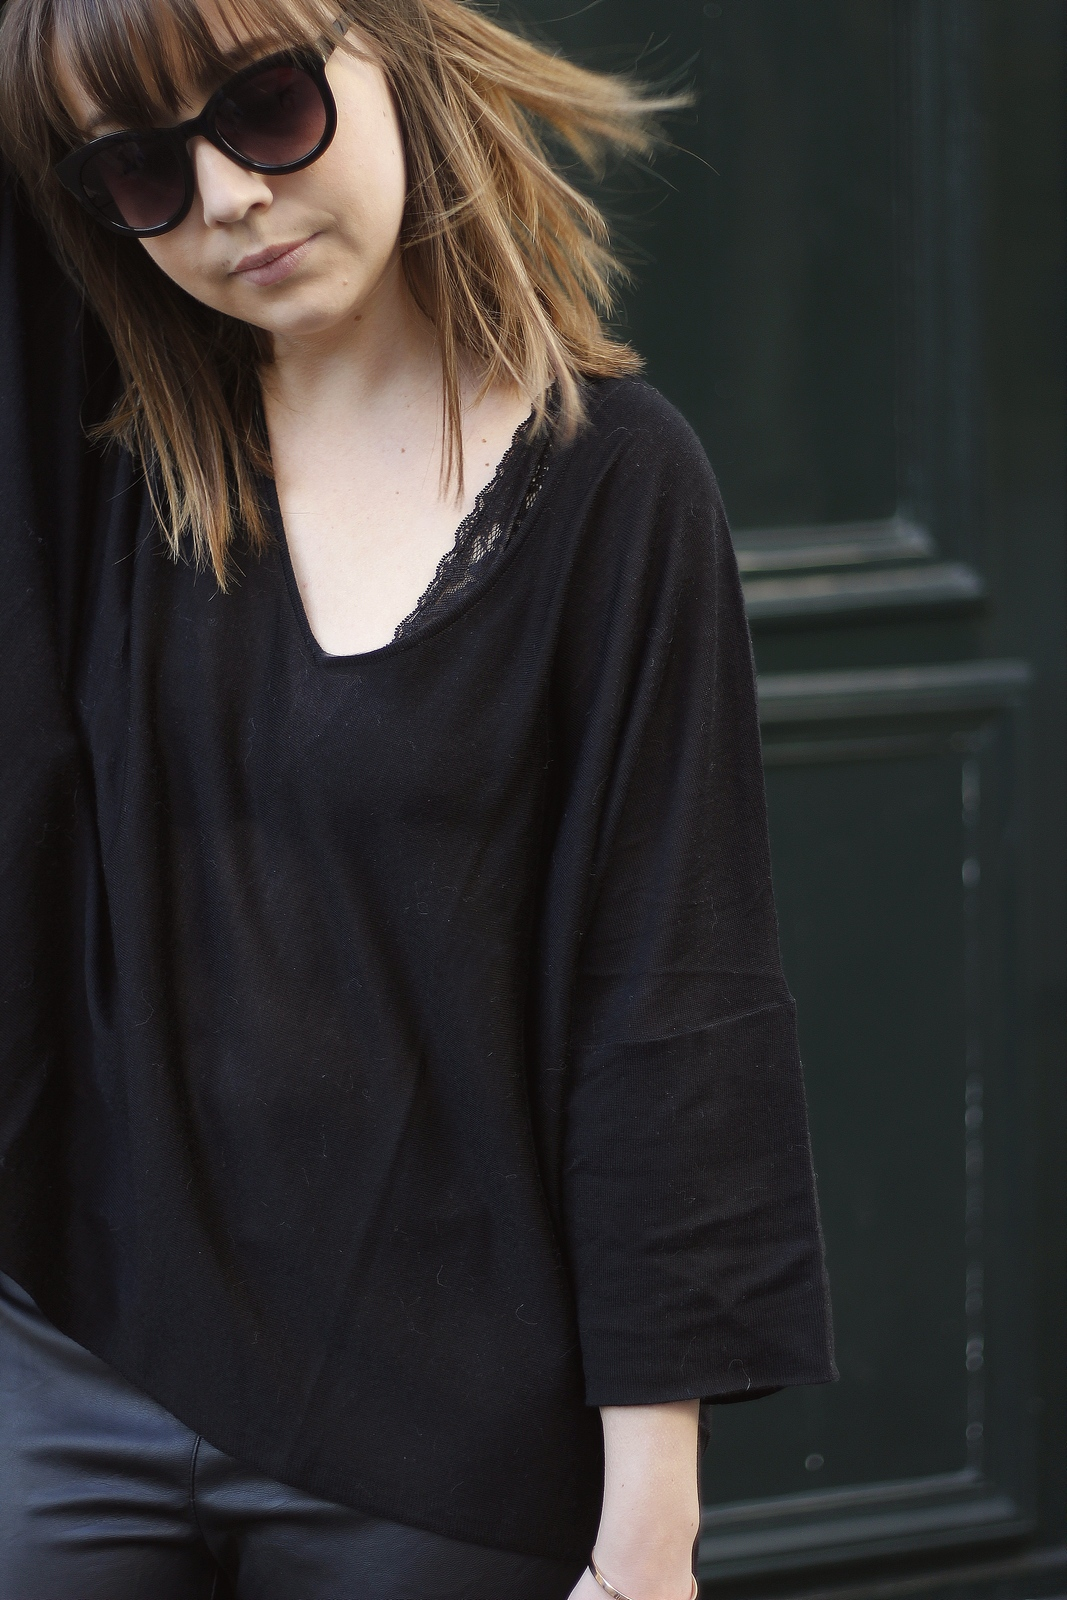 burton - chicenpull - chicessentiel - burton on london - pull noir - concours